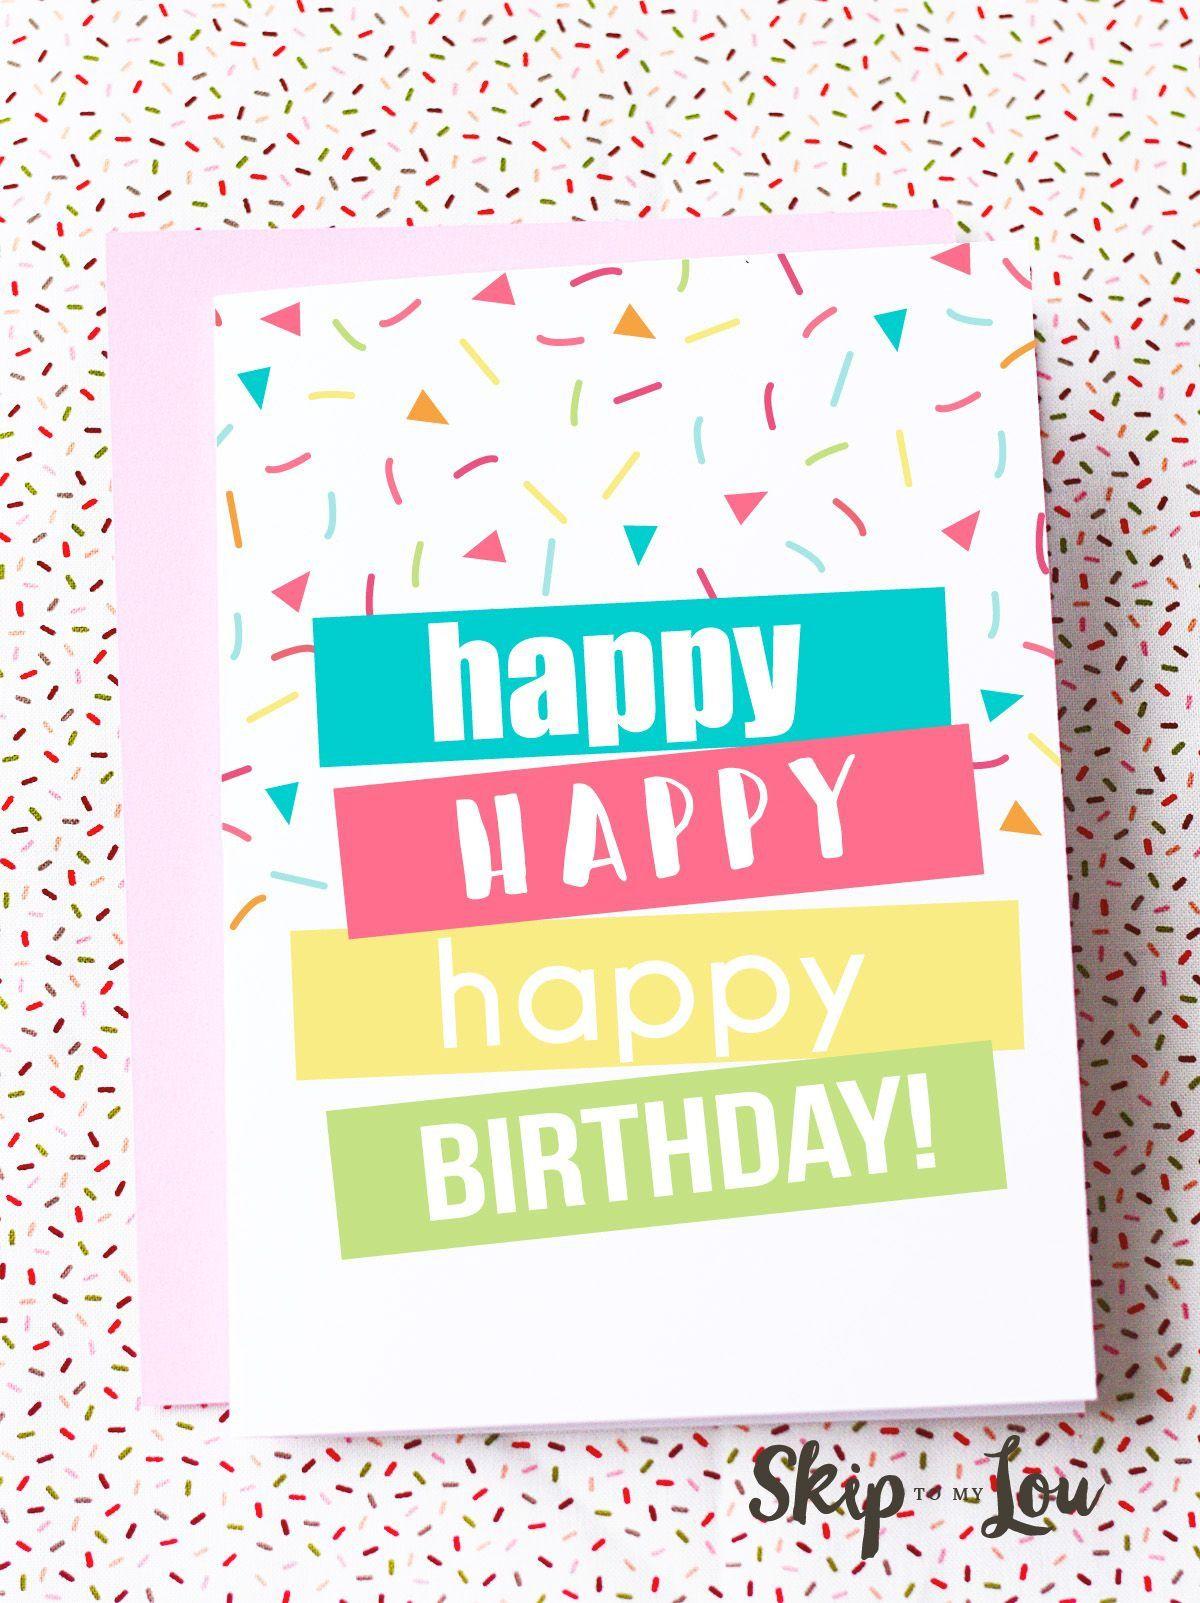 007 Wondrou Free Printable Birthday Card Template For Mac Design Full